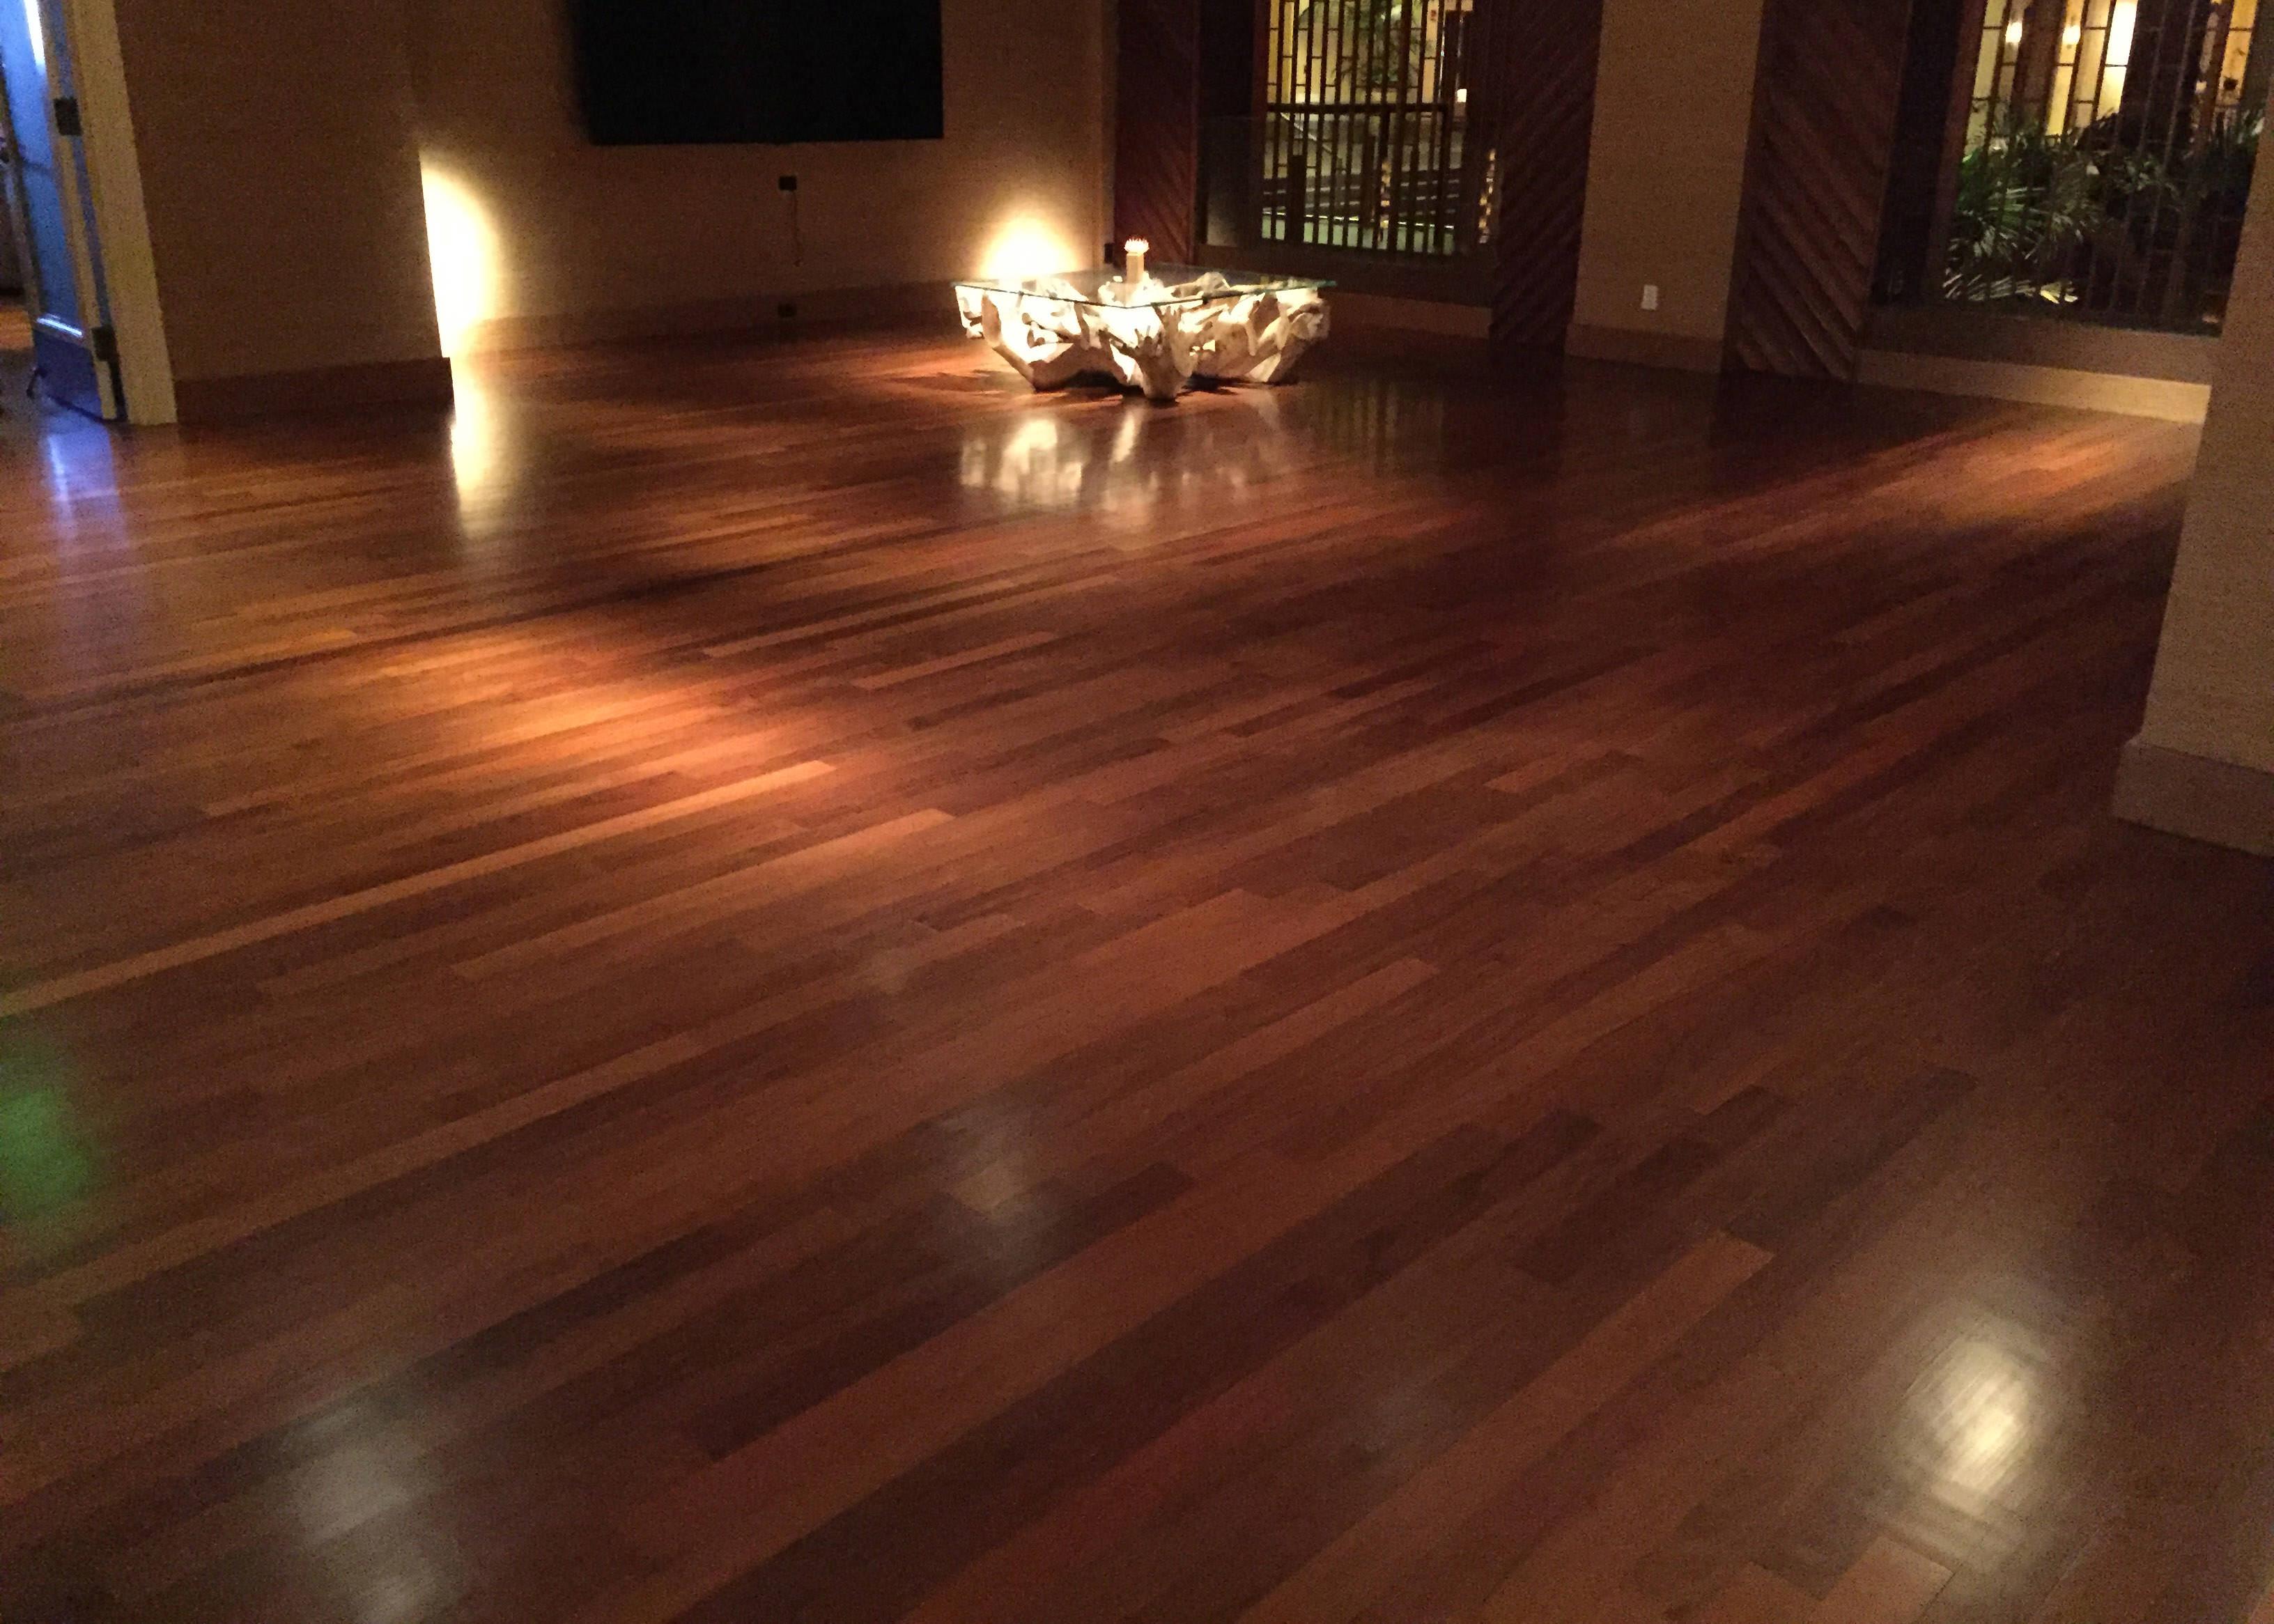 ... Ipe Hardwood Flooring In Sitting Area At Four Seasons In Wailea Maui